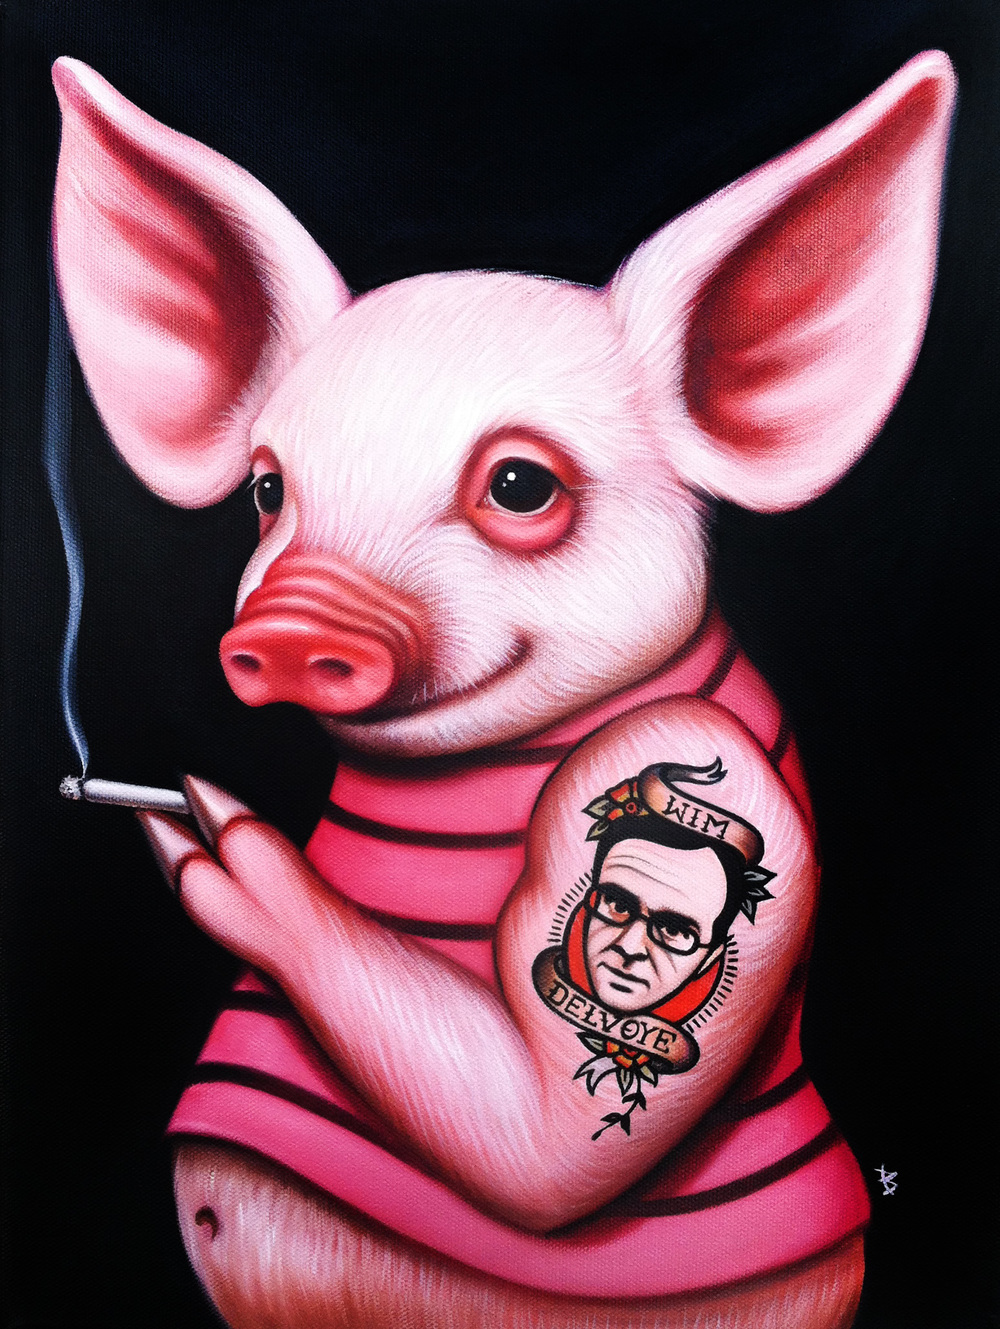 Piglet: All Growns Up